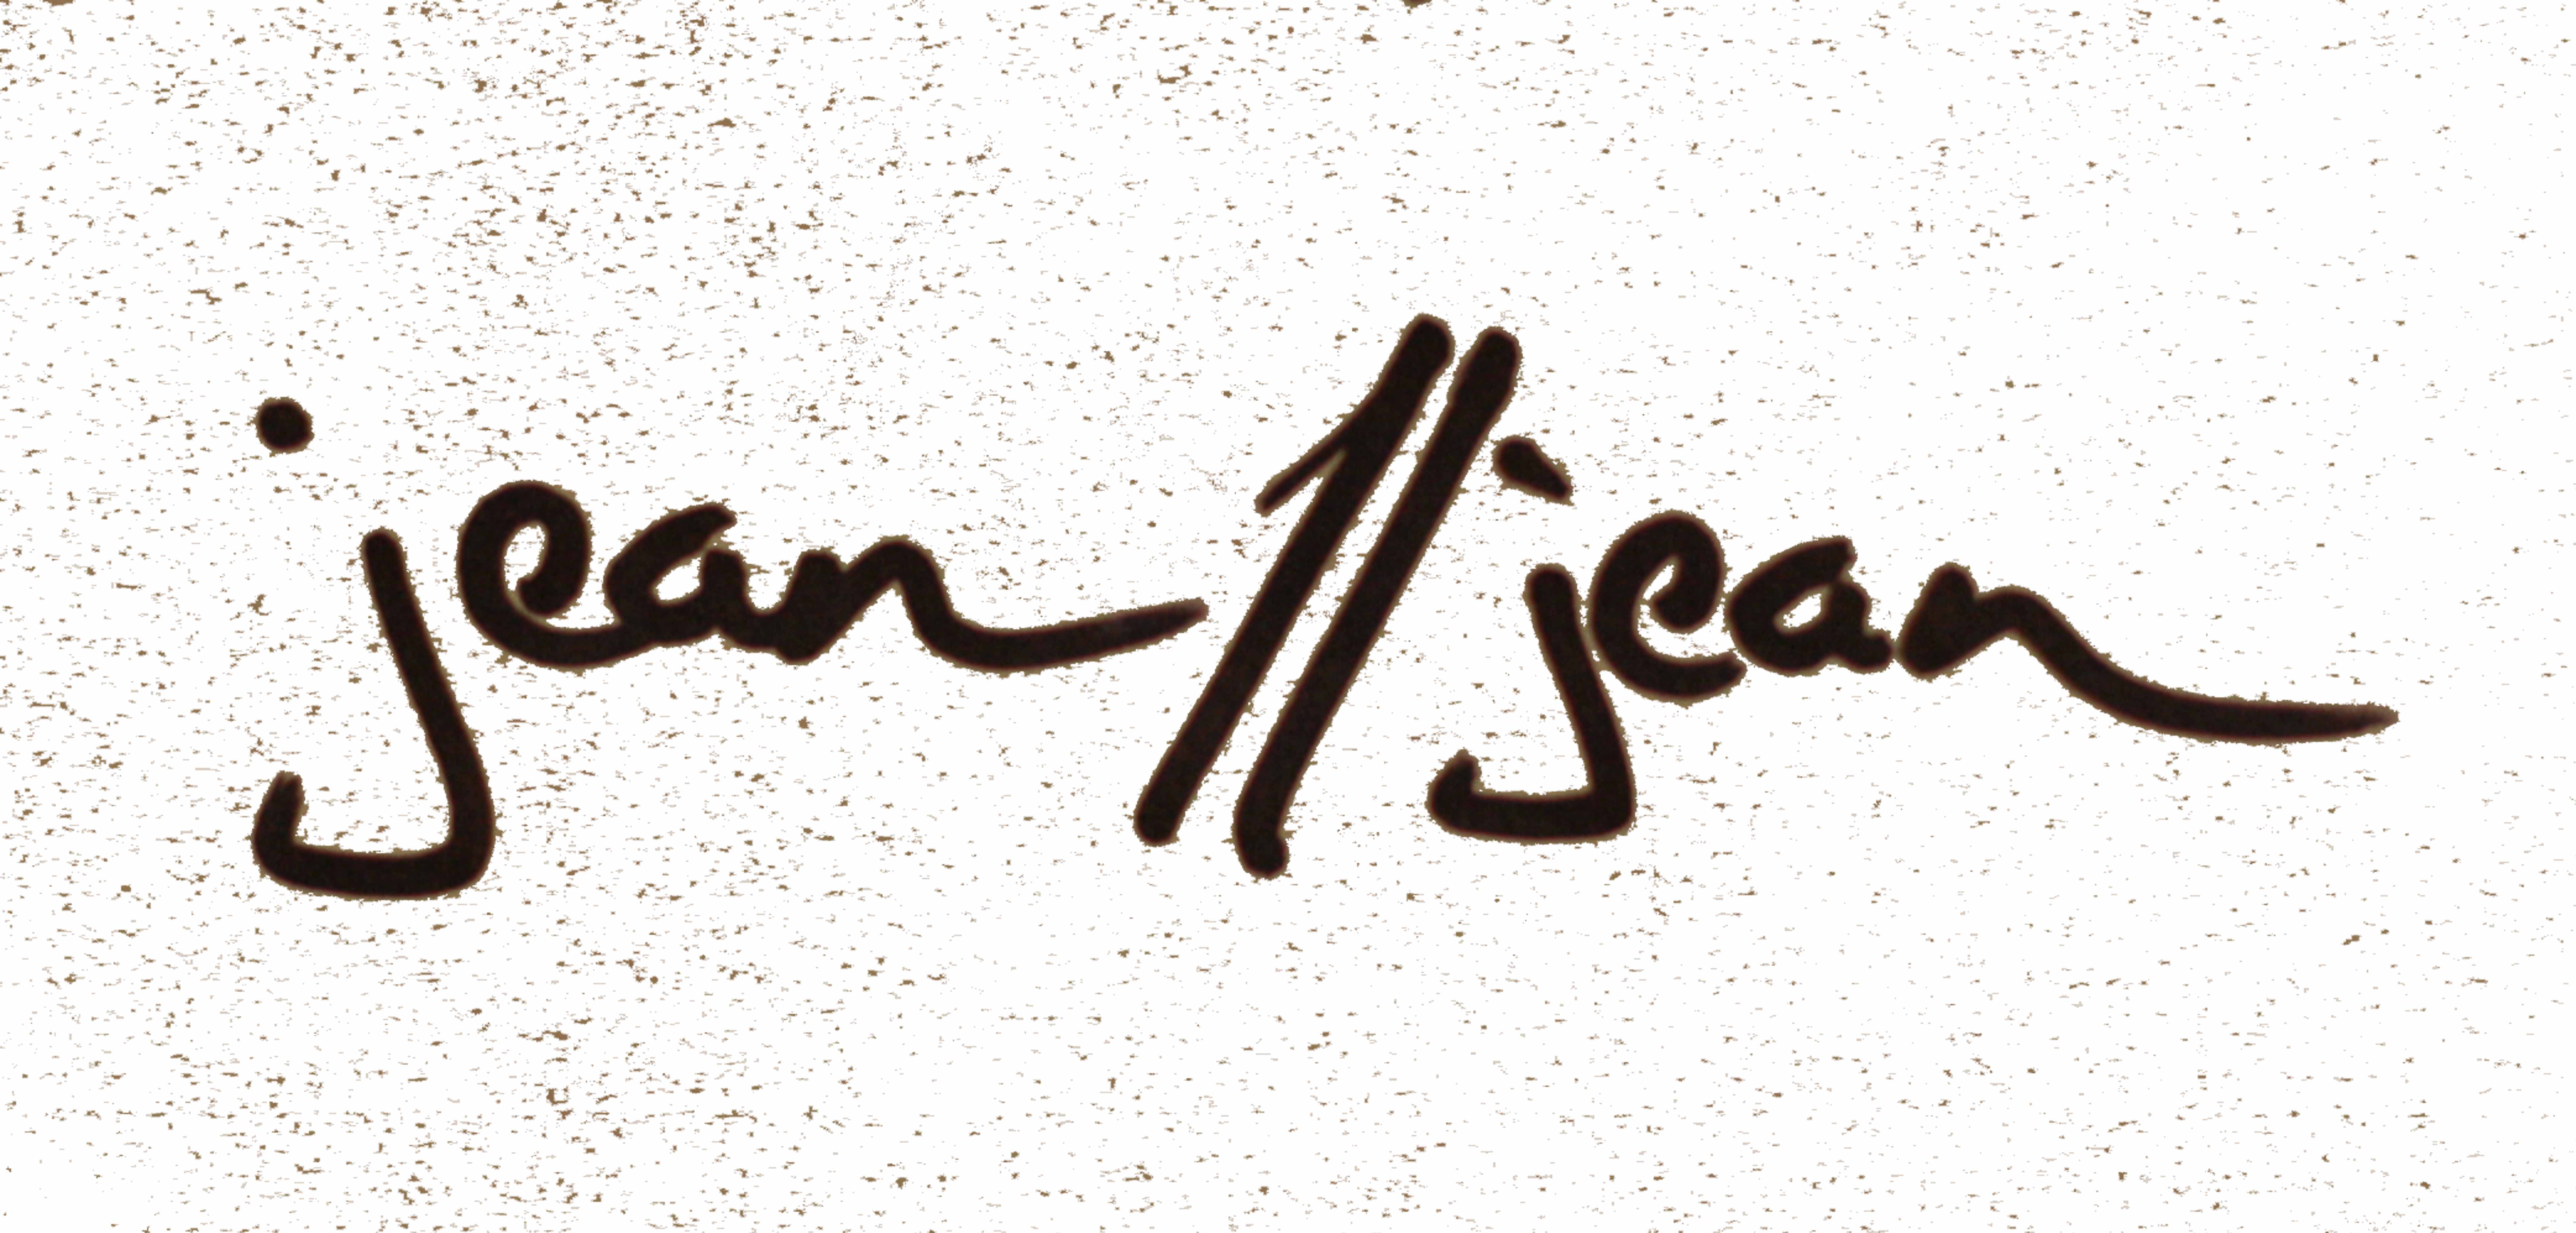 jean//jean